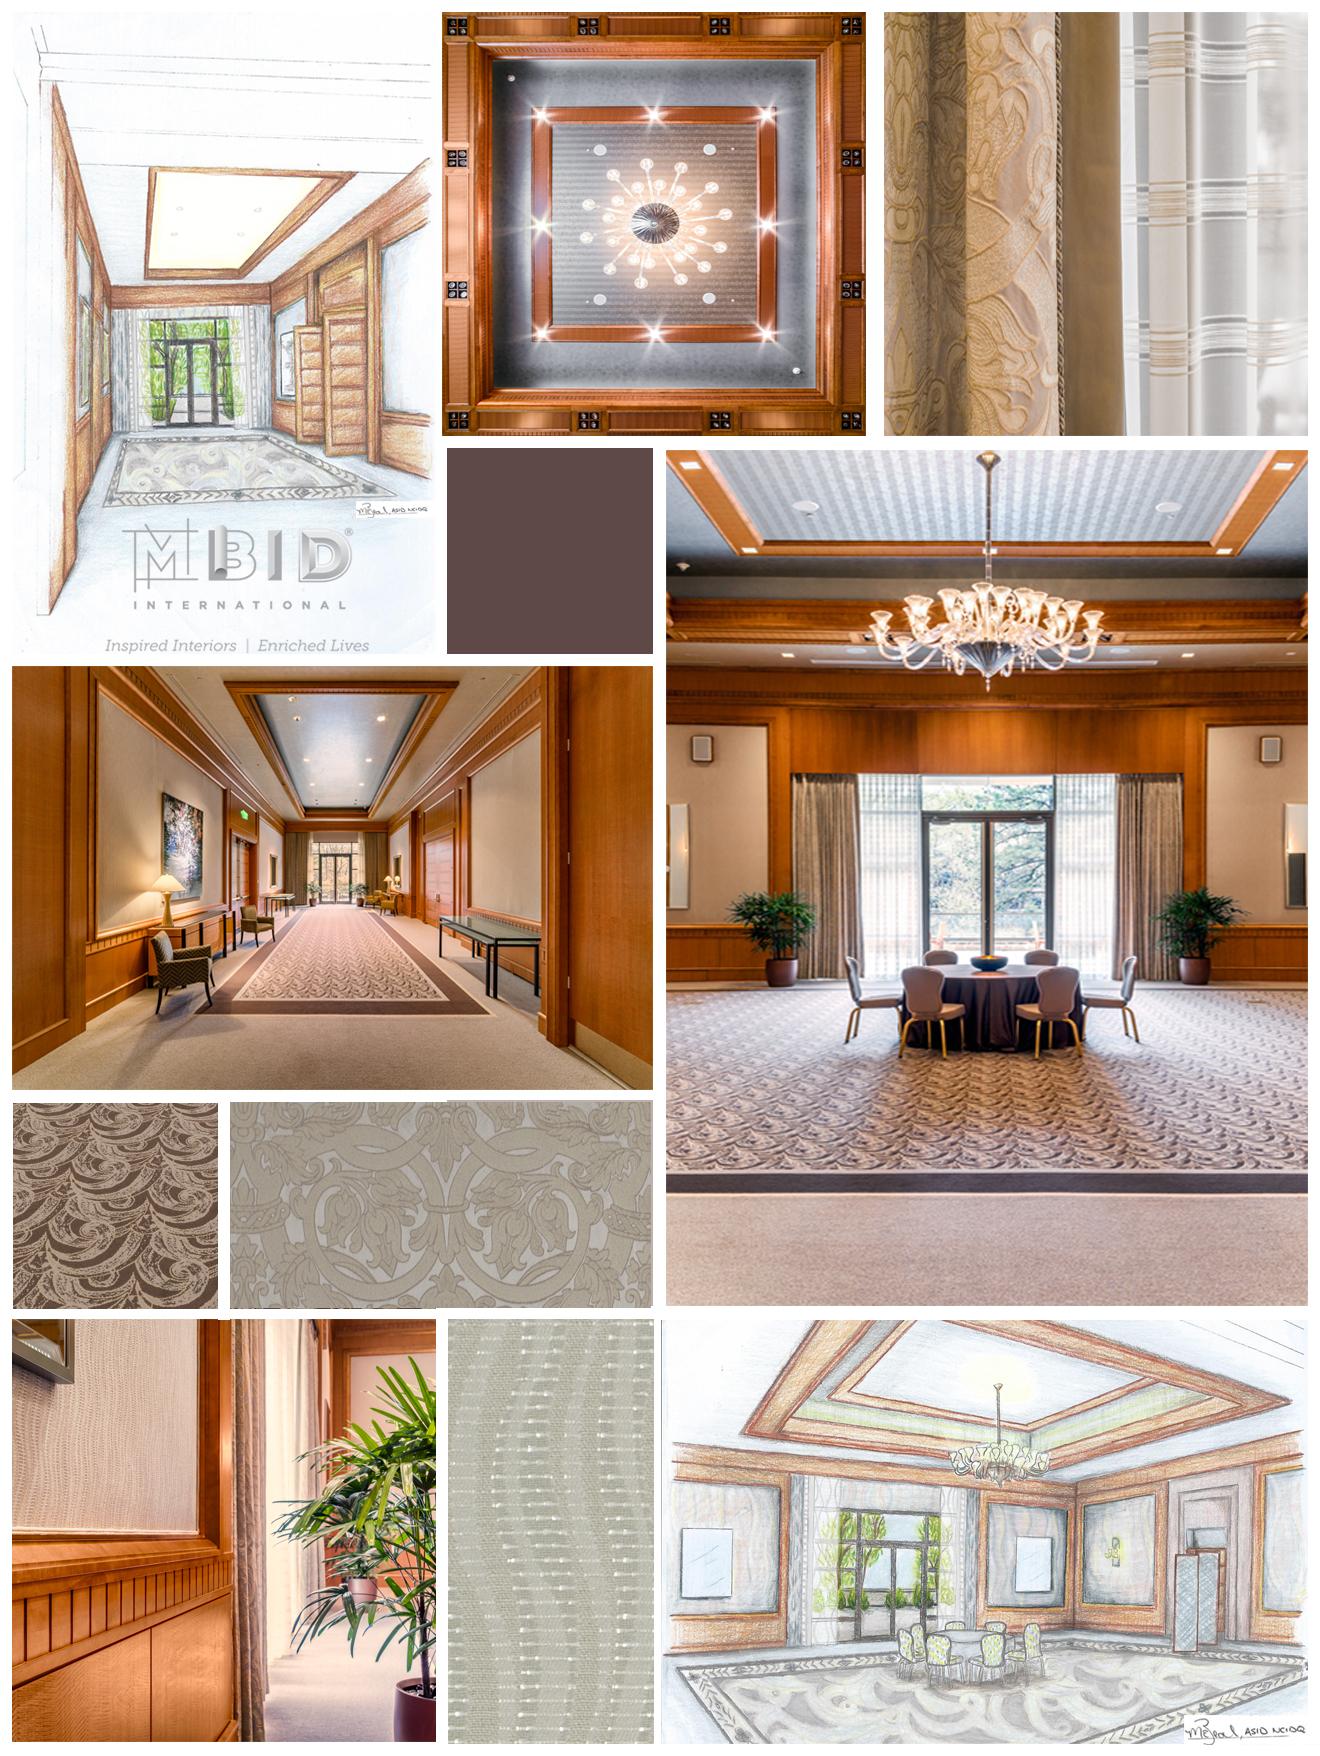 Luxury Hotel Event Center Interior Design North Carolina